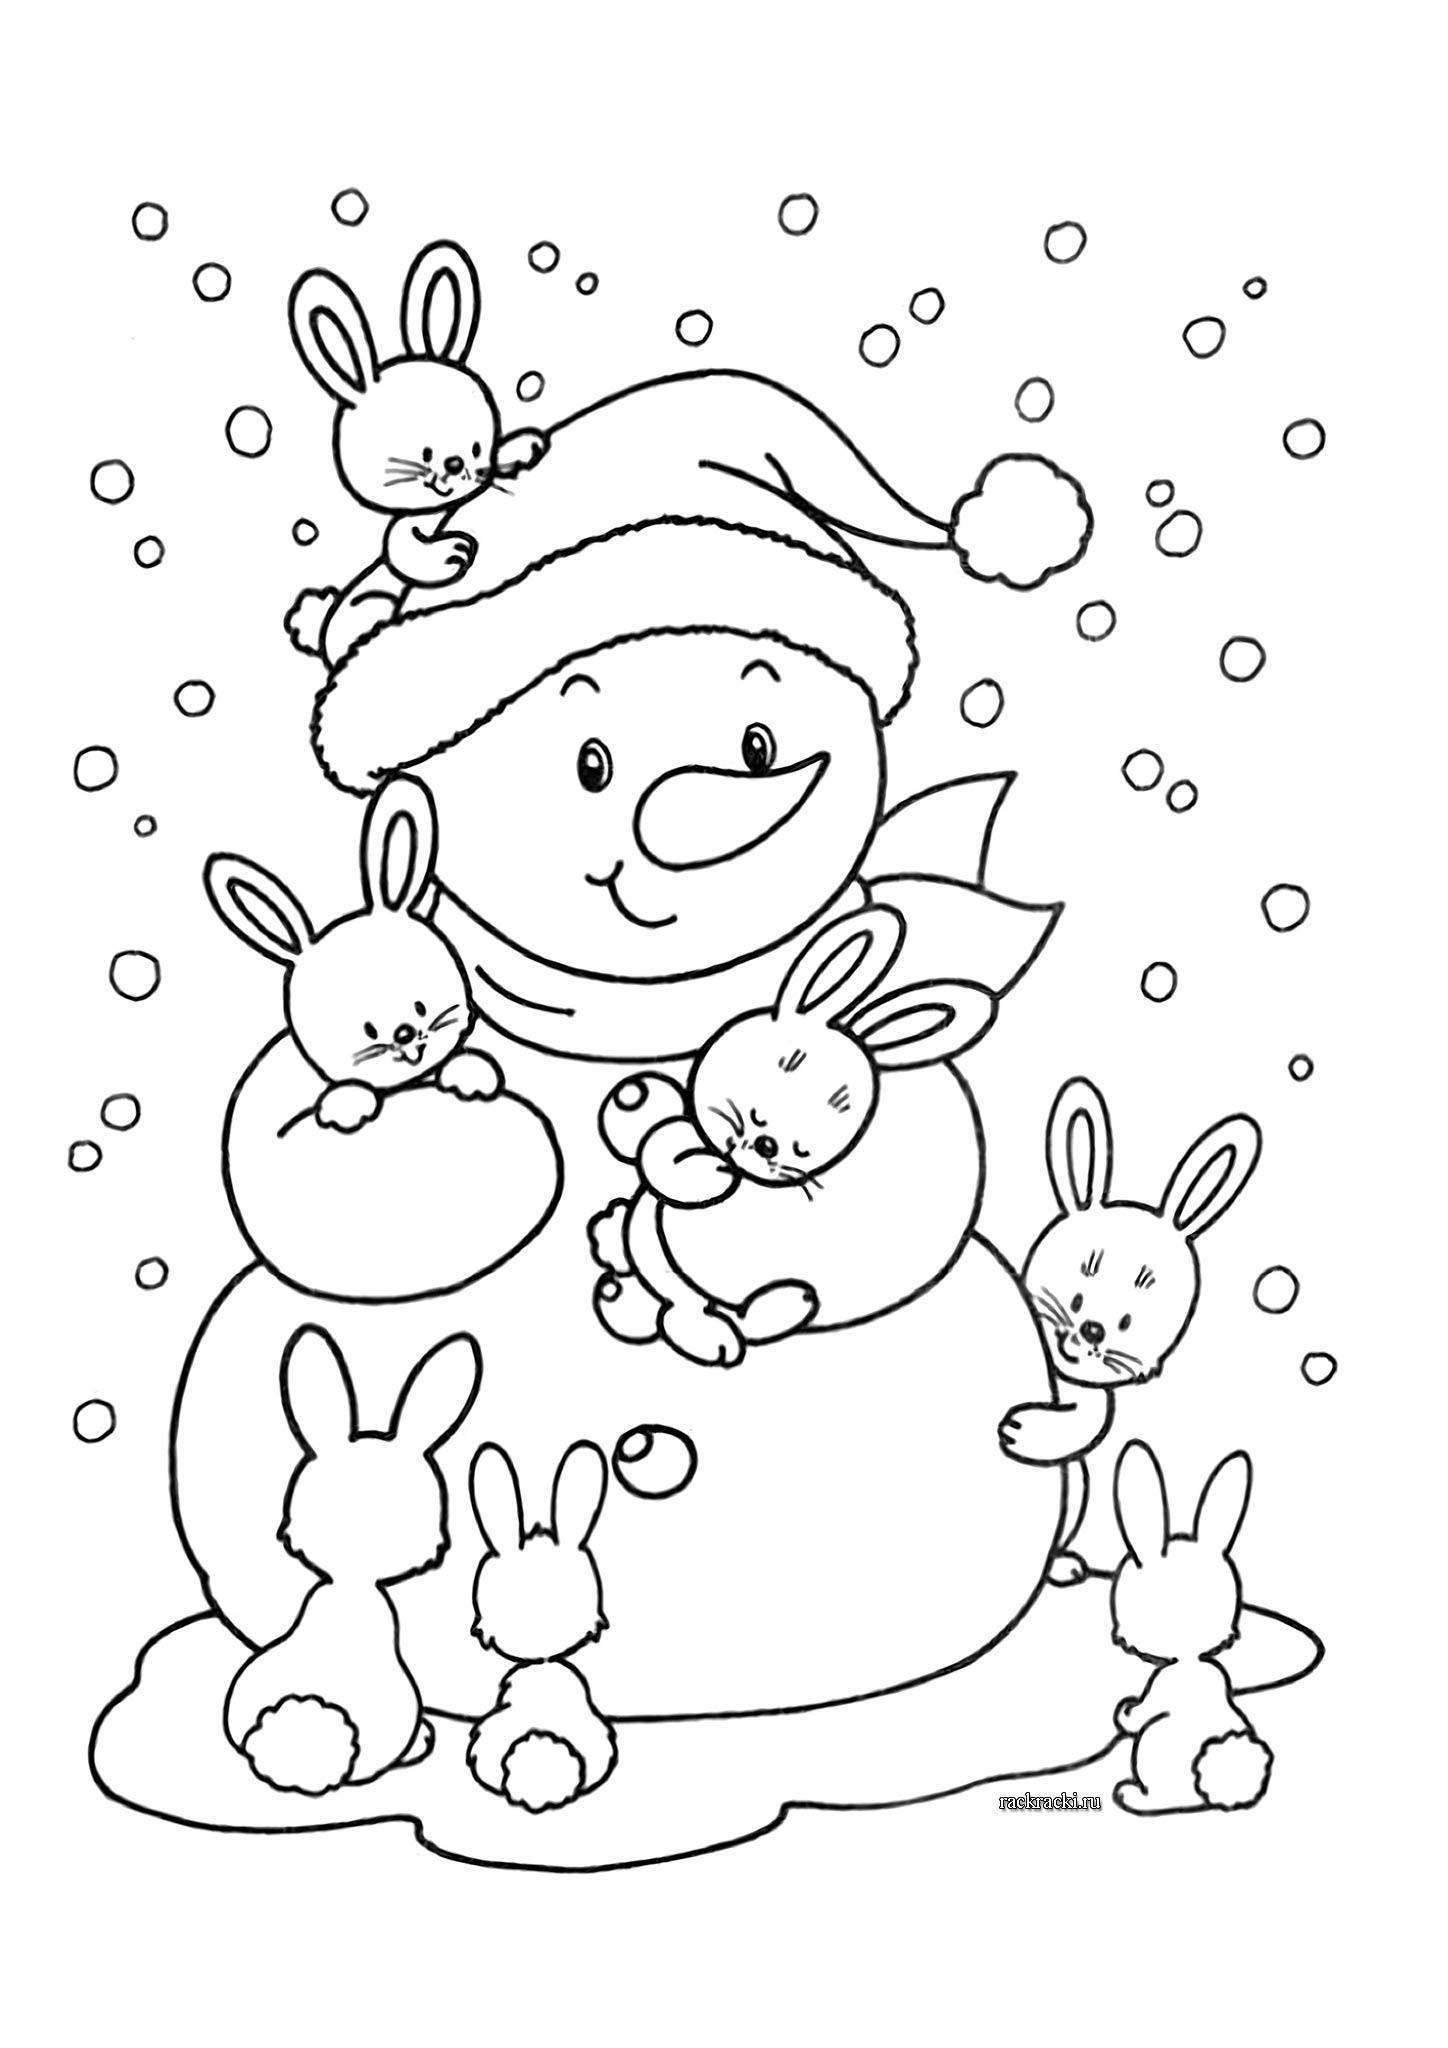 Снеговик с зайцами Рисунок раскраска на зимнюю тему